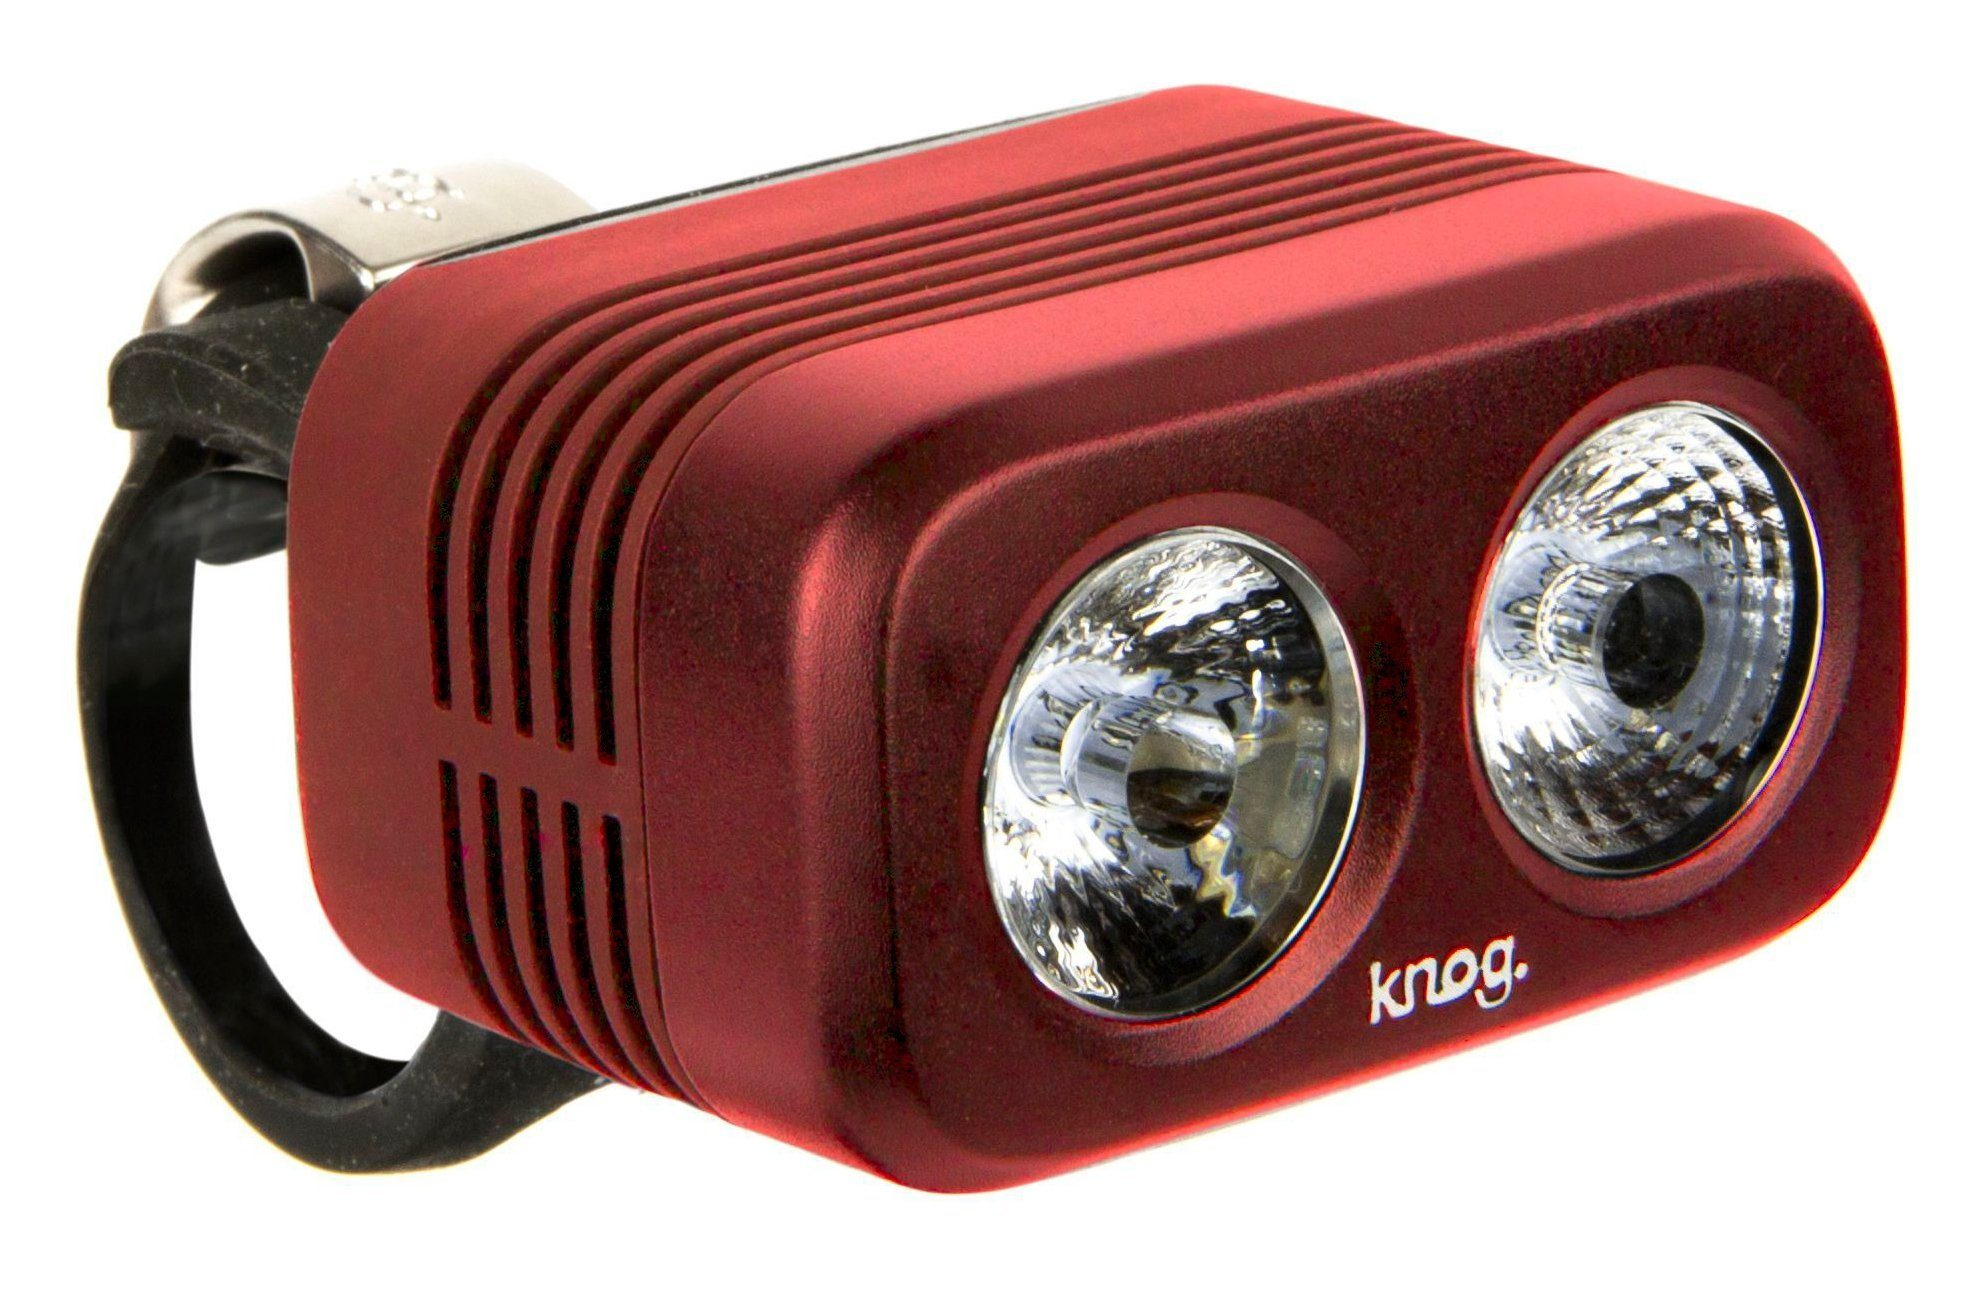 Knog Fahrradbeleuchtung »Blinder Outdoor 400 Frontlicht weiße LED«